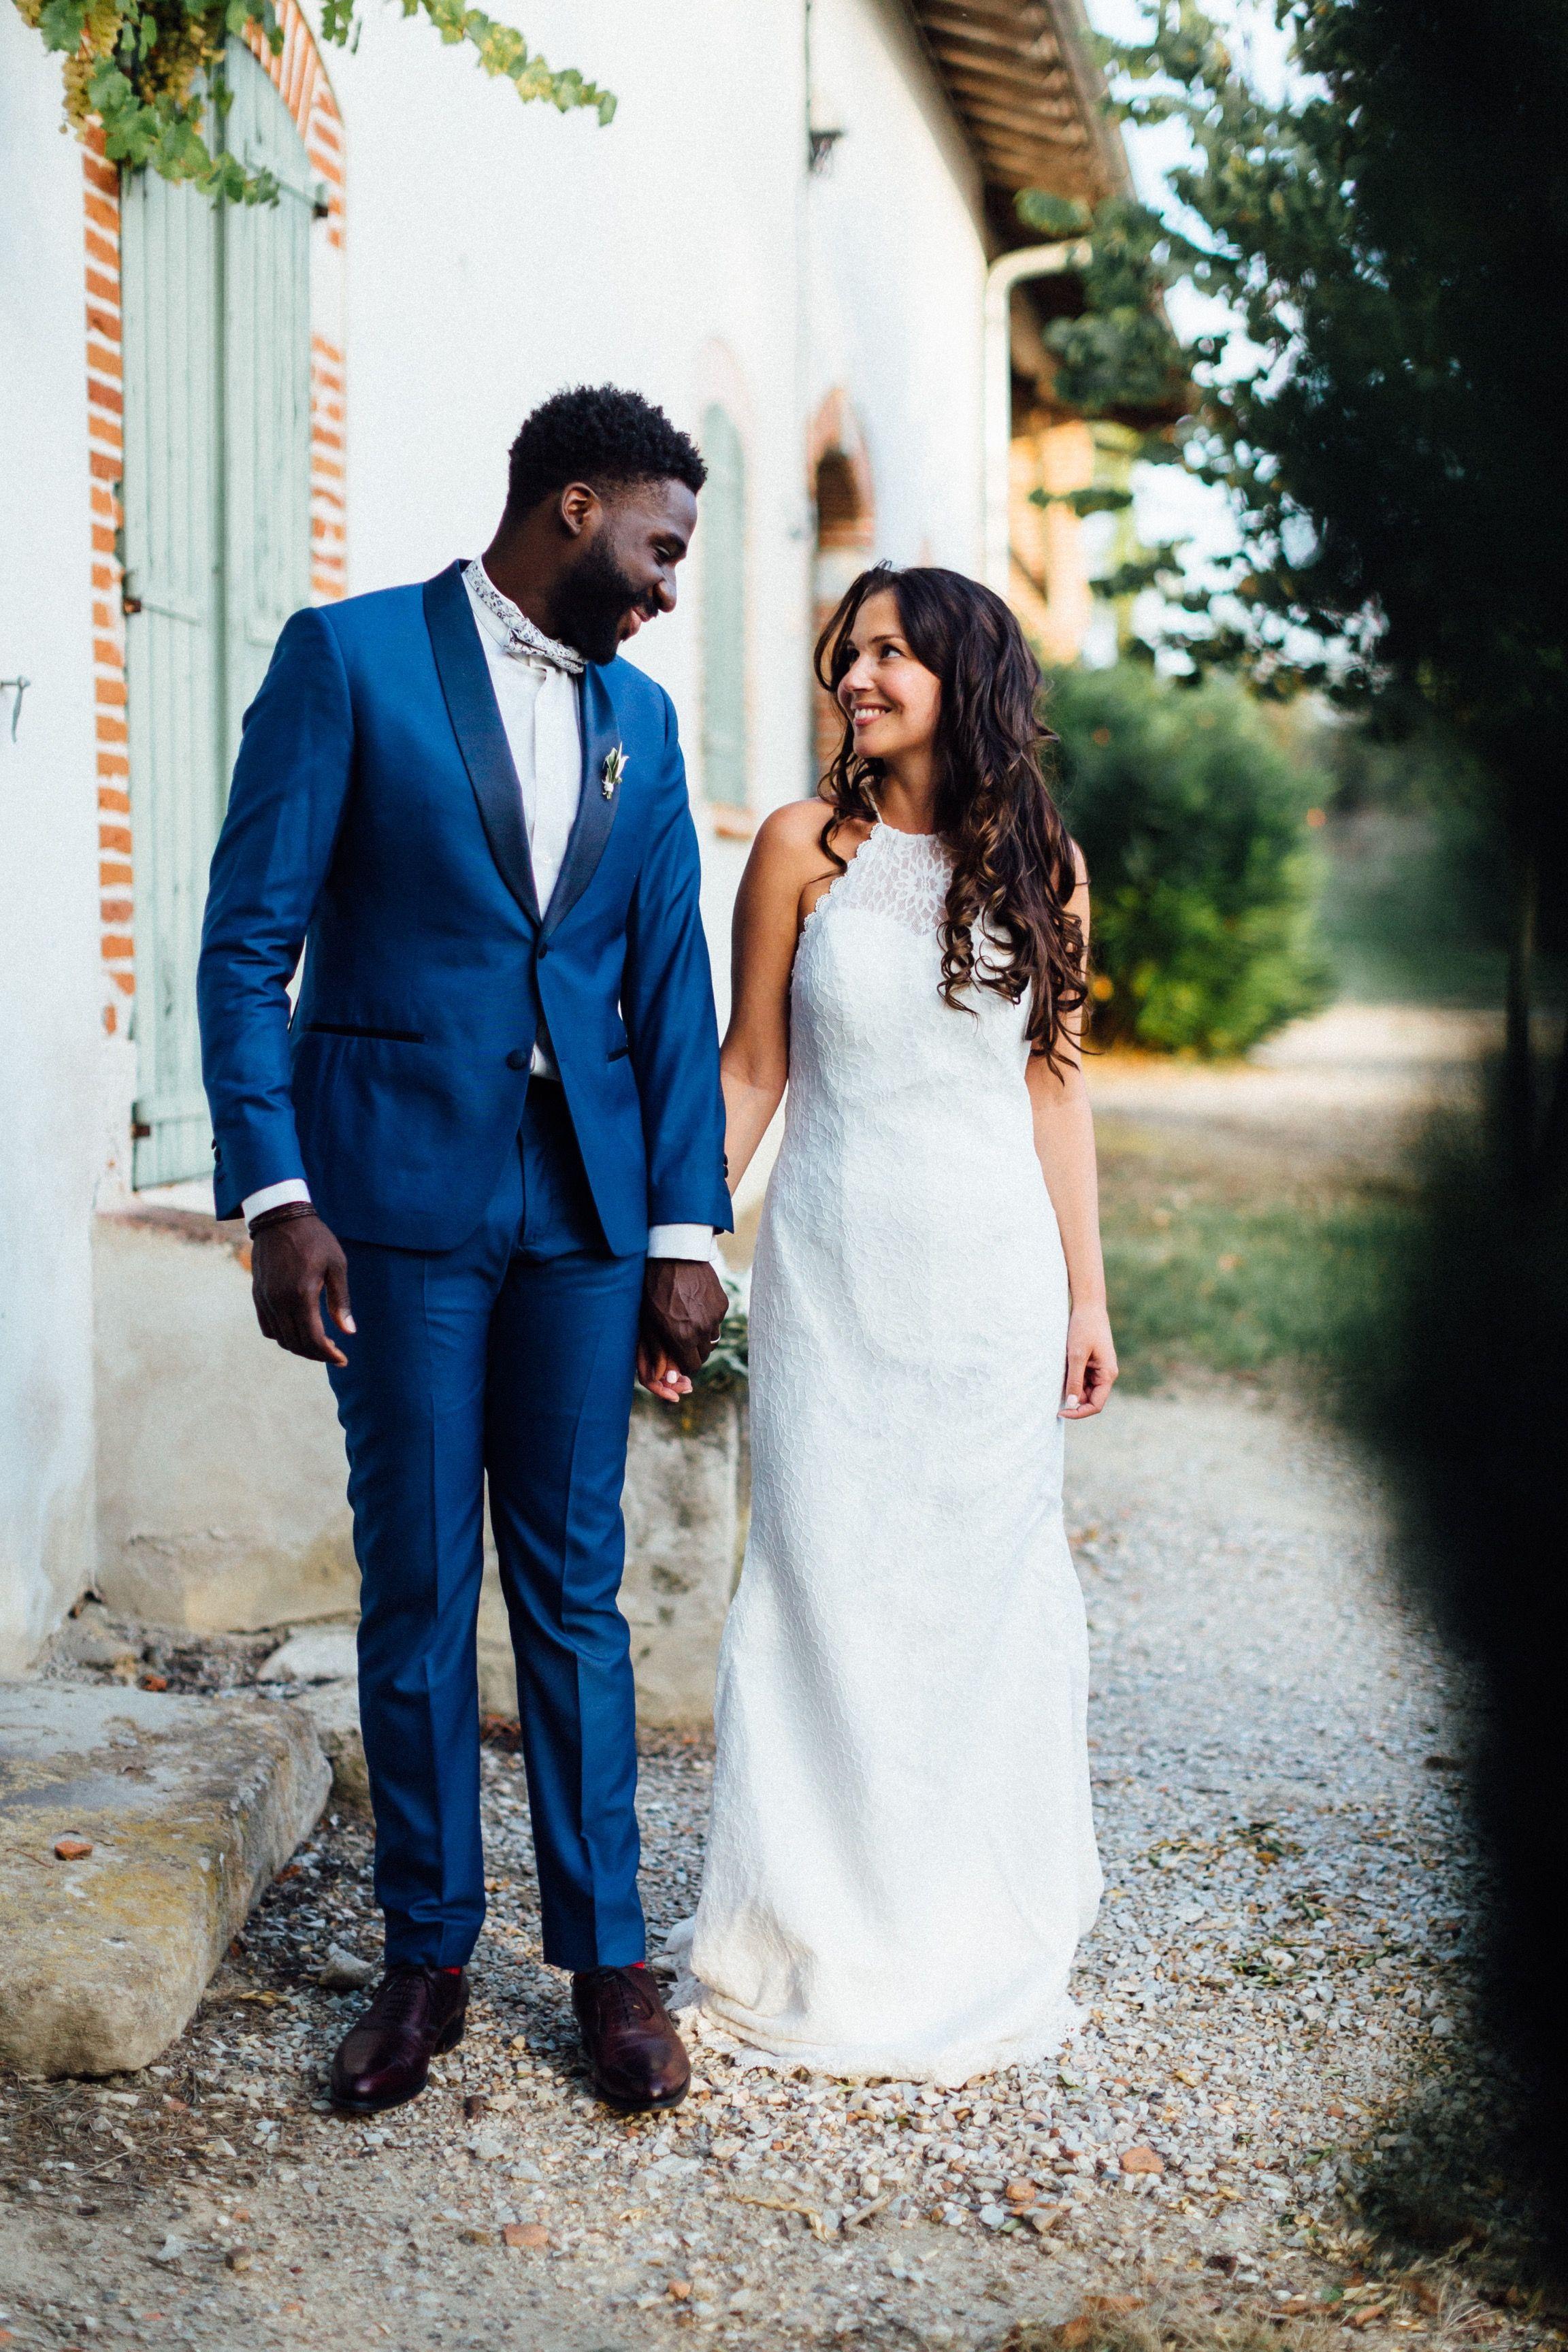 52-shooting inspiration italian lemon wedding photographe